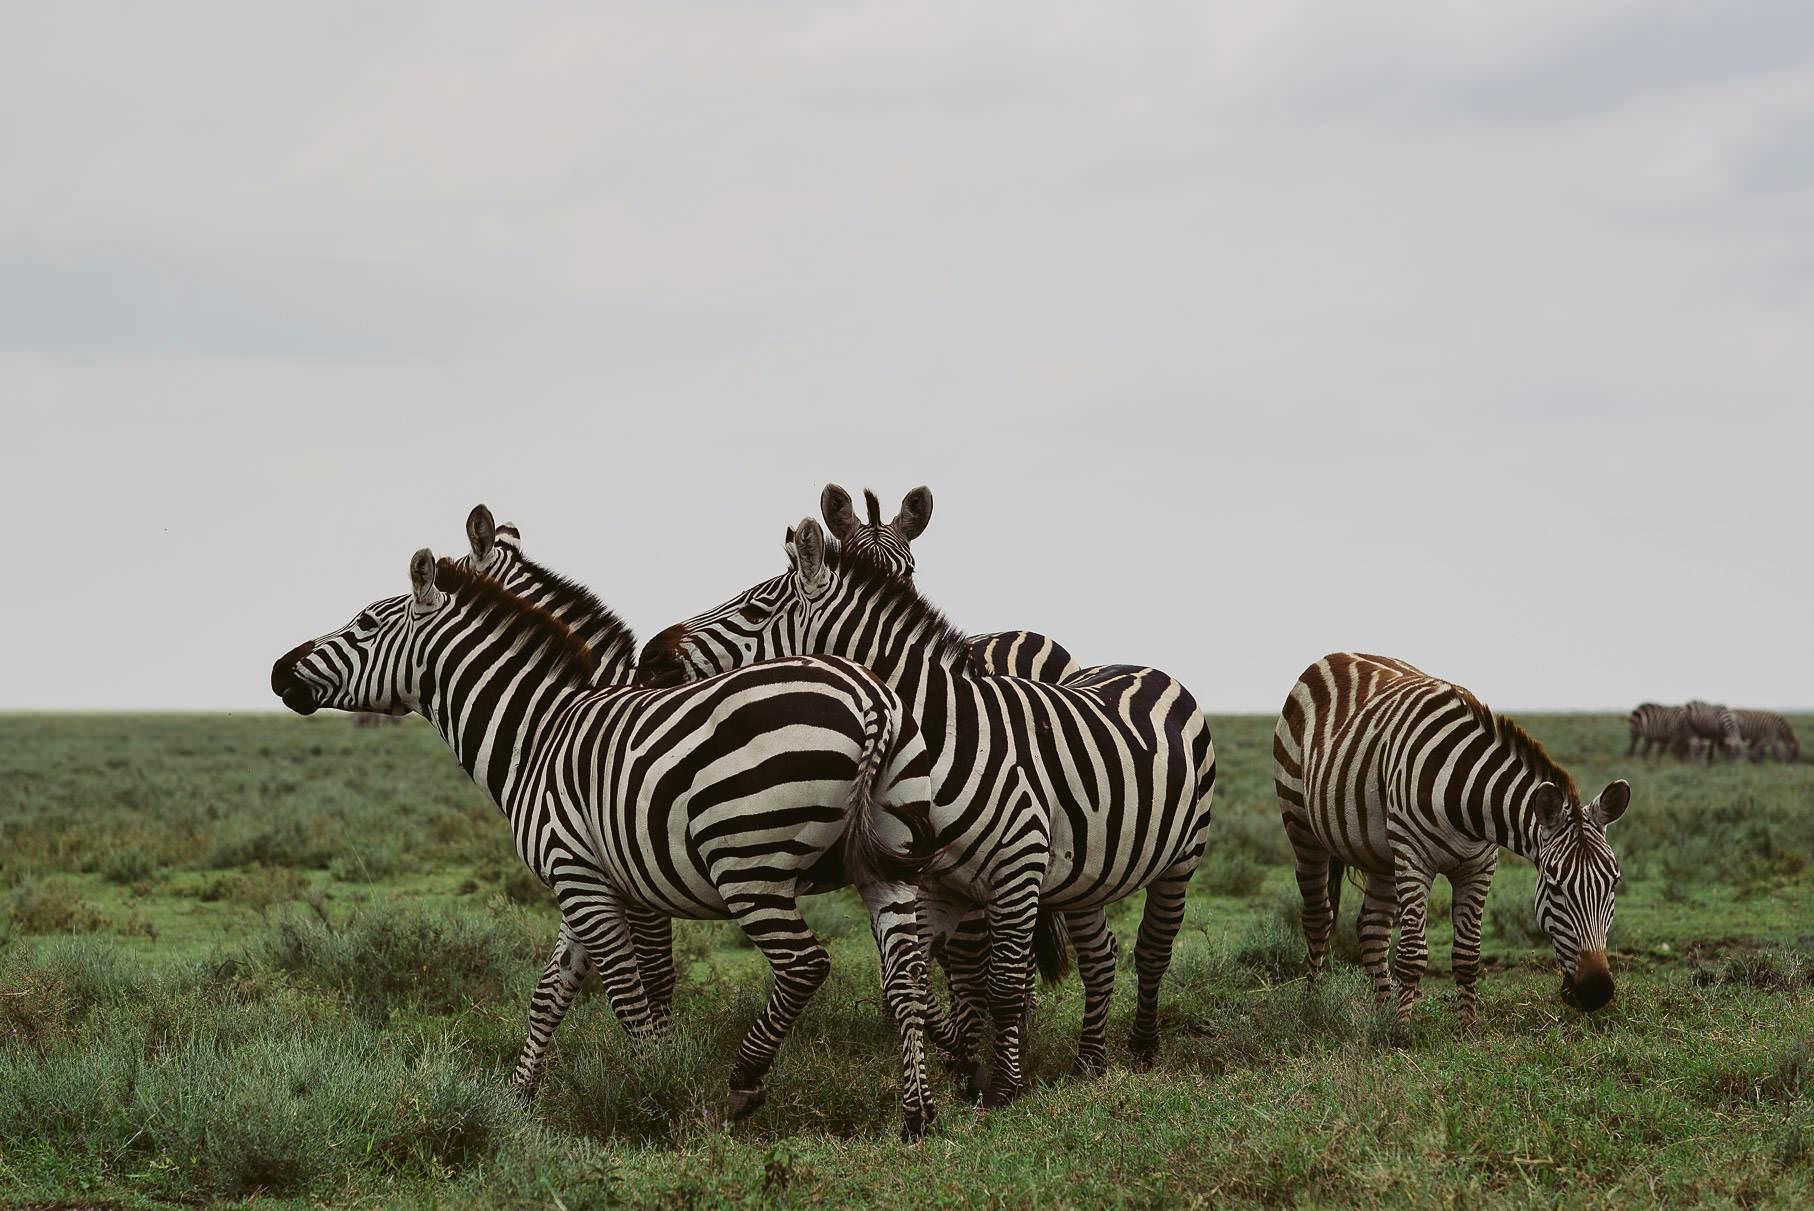 0040 tansania nd6 7385 anne bjoern fotografie hochzeitsfotograf hamburg - This is Tanzania - Serengeti, Kilimanjaro & Sansibar